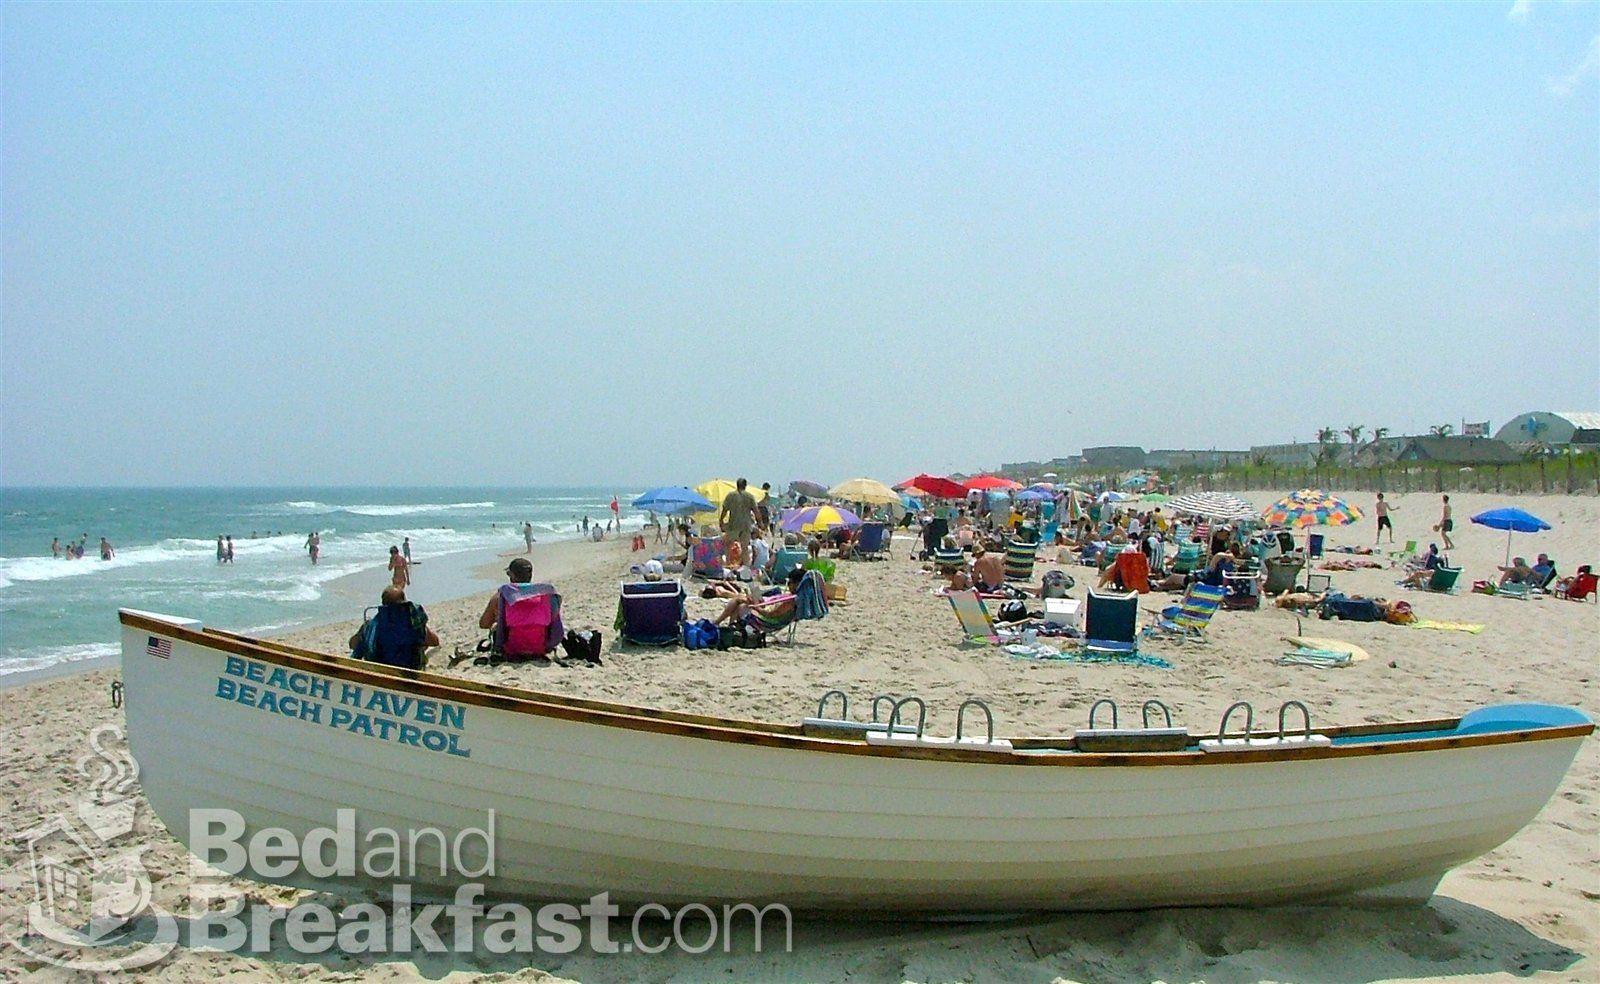 Personals in beach haven nj Women Seeking Men in Point Pleasant Beach nj Personals -